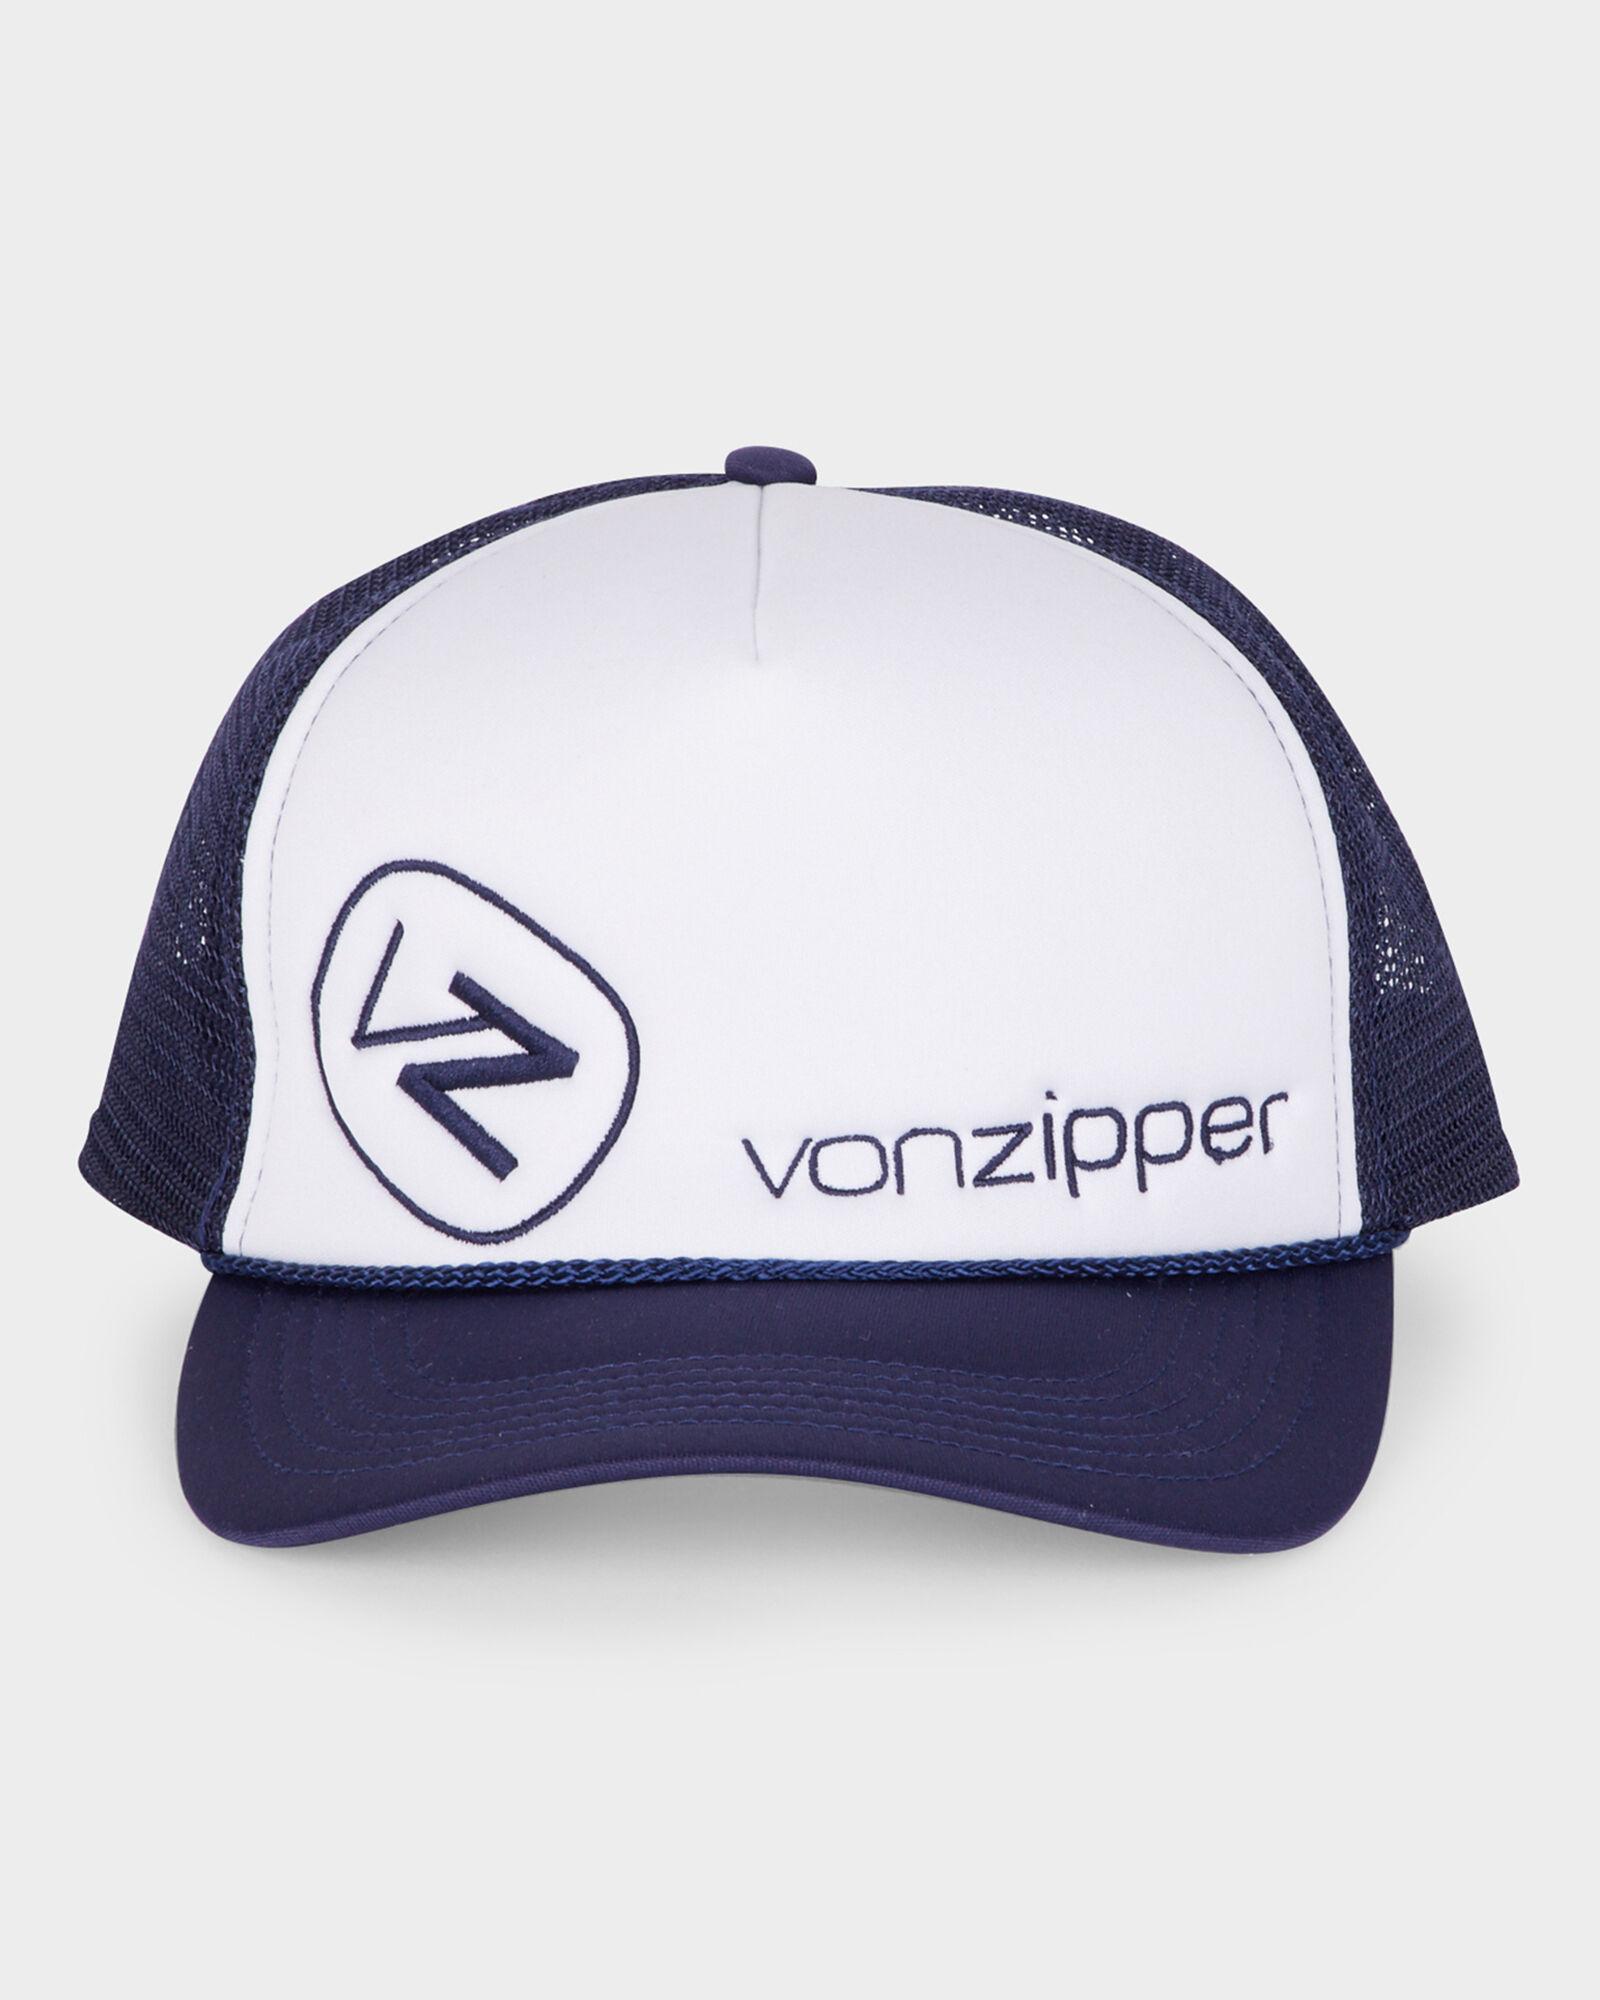 VON ZIPPER CAP NEW Unisex MENS MOBY CLASSIC TRUCKER SURF Red White Surf Skate